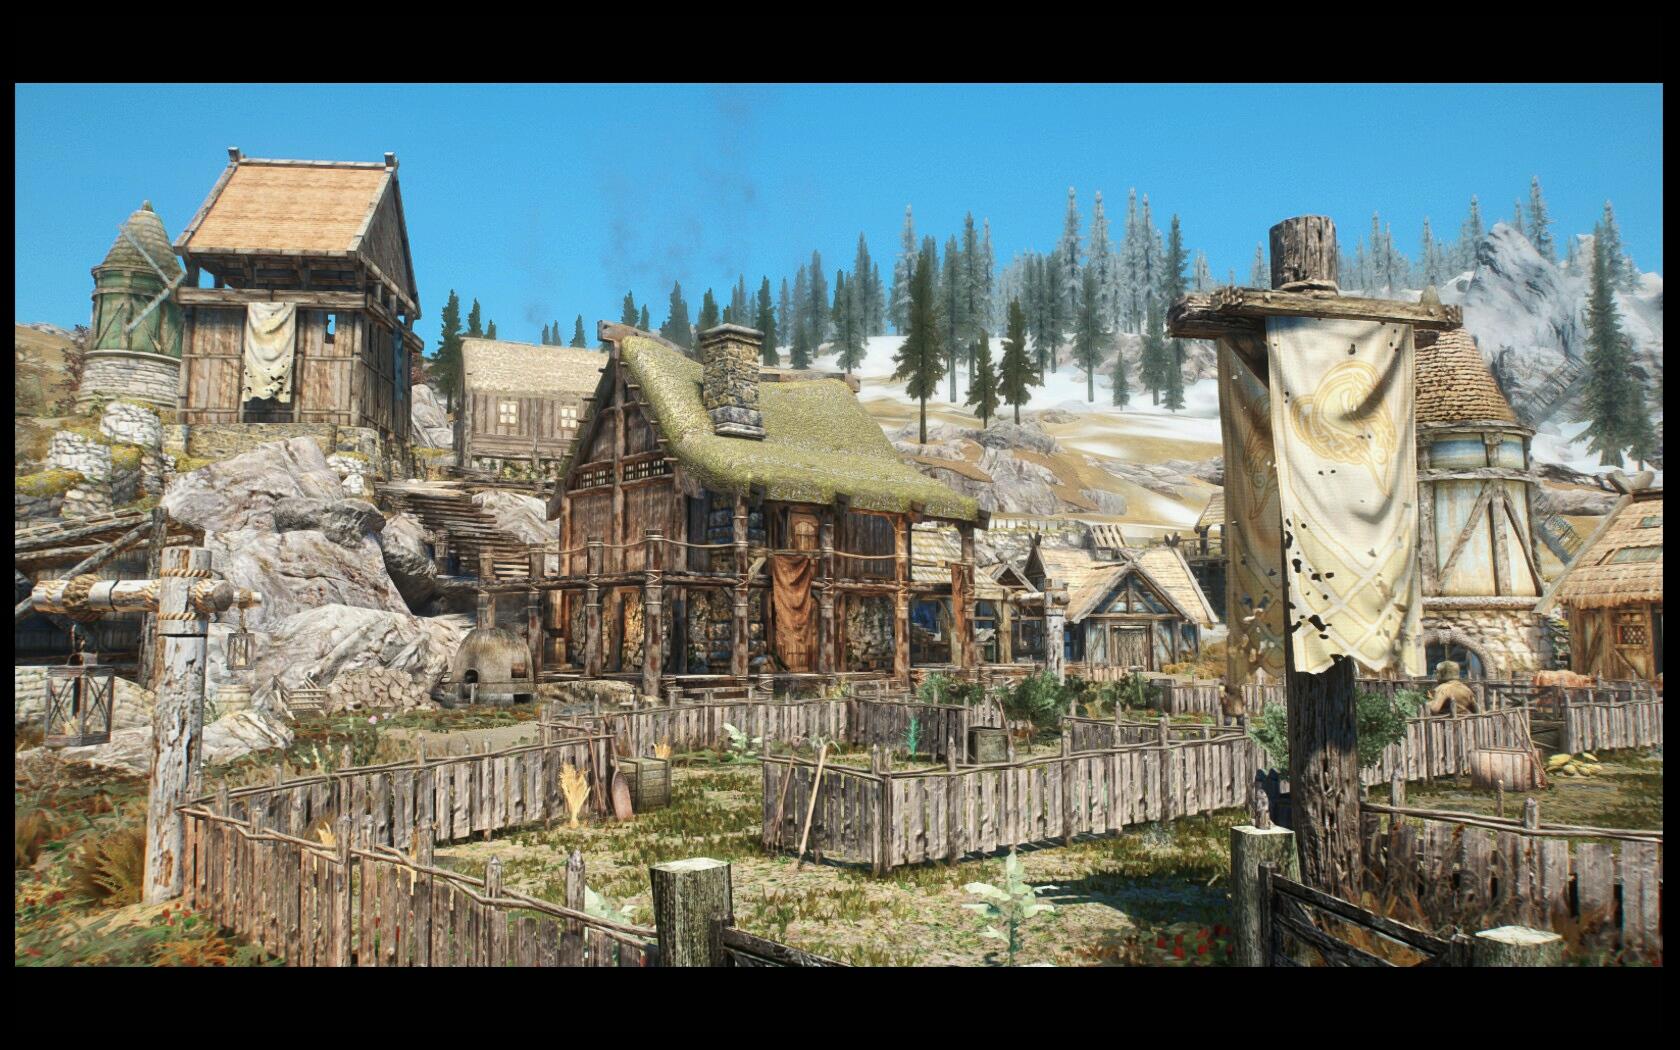 Heljarchen Farm Skyrim Mod Animal Crossing New Horizons